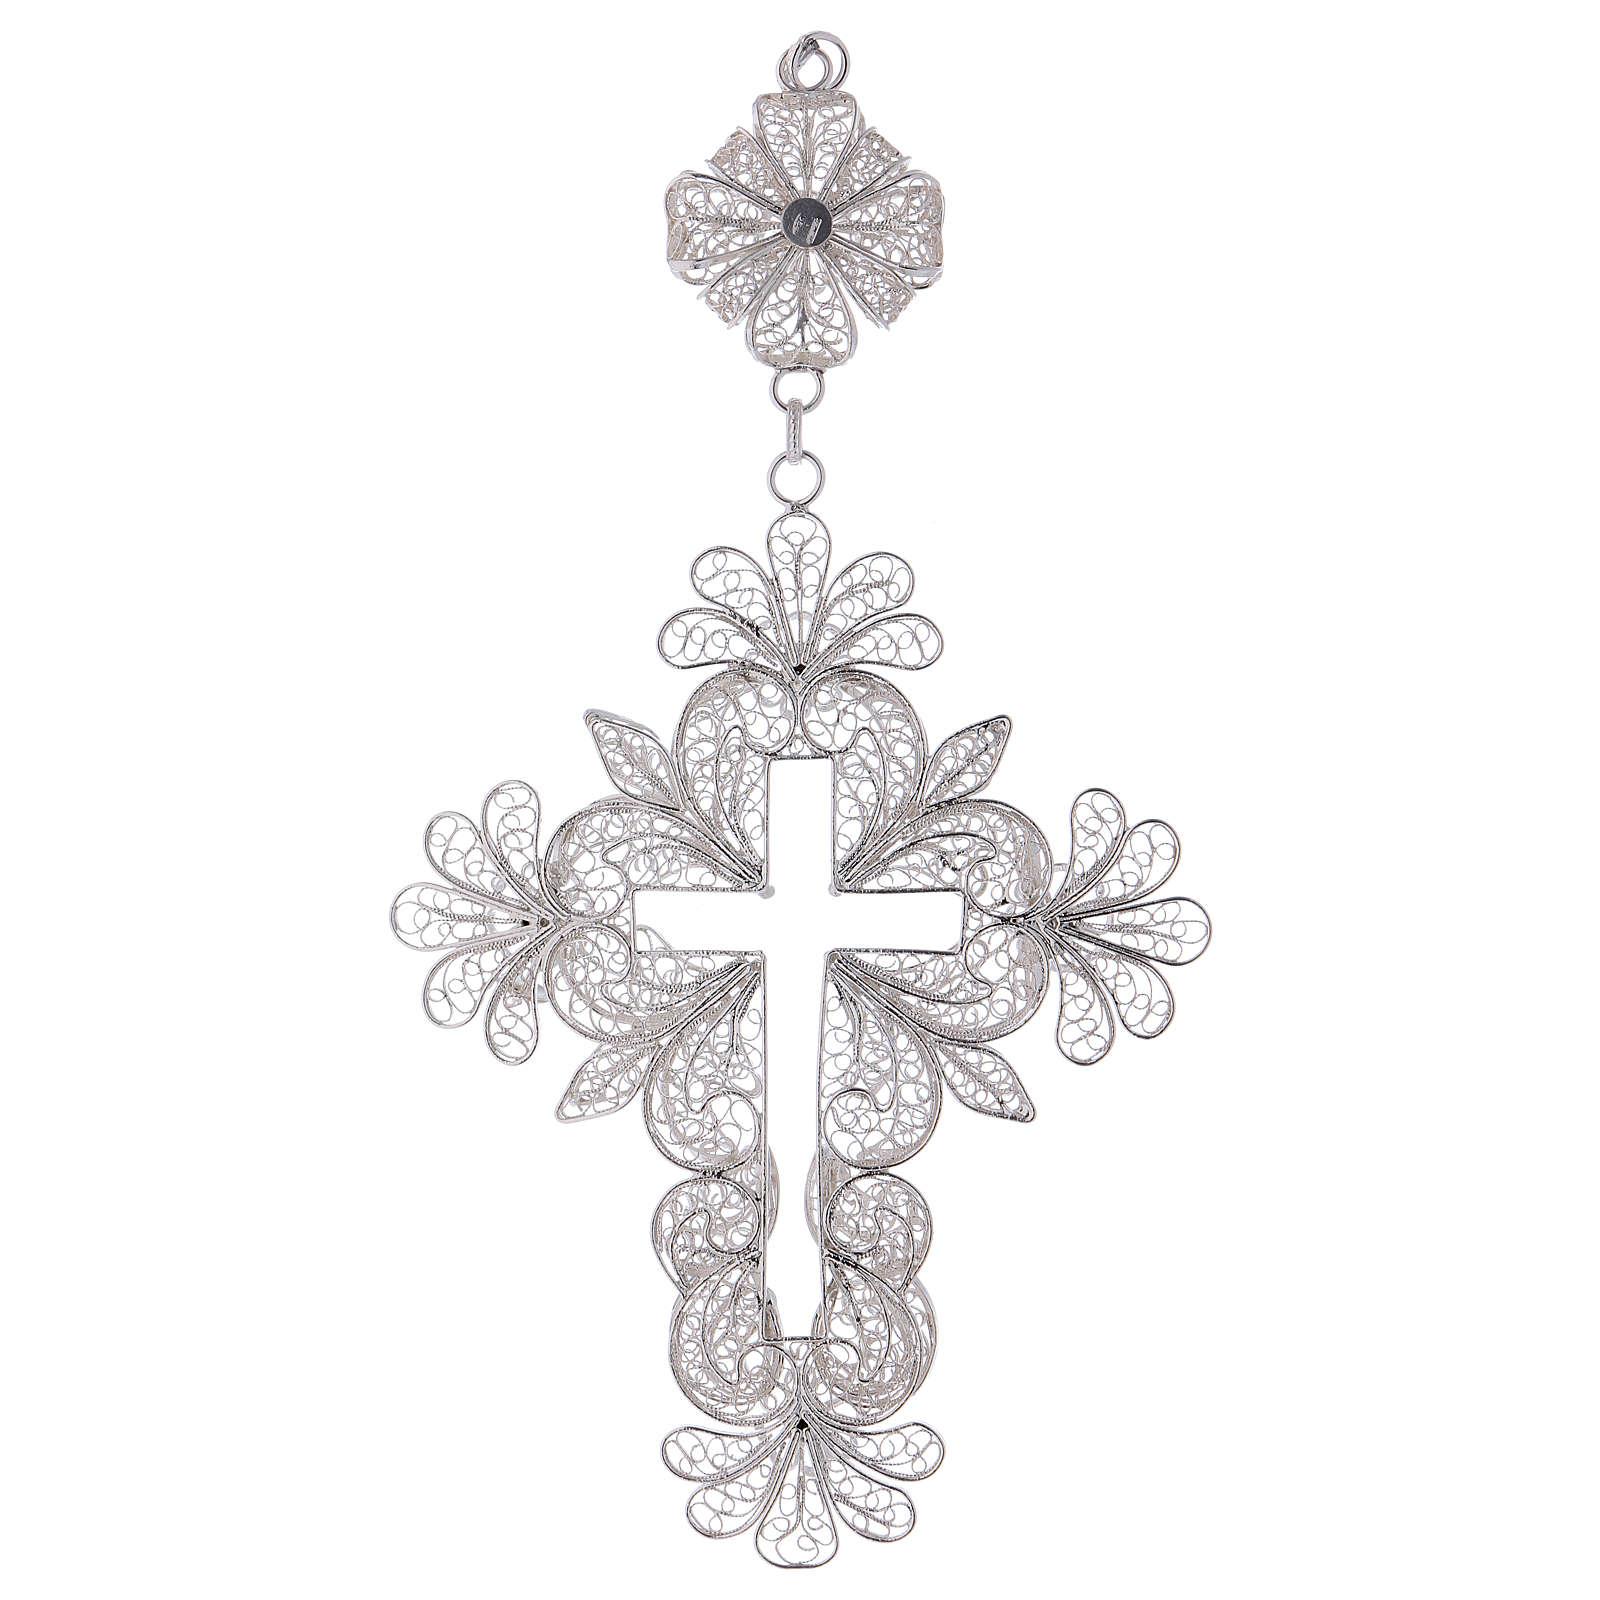 Croix pectorale en argent 800 filigrane 3